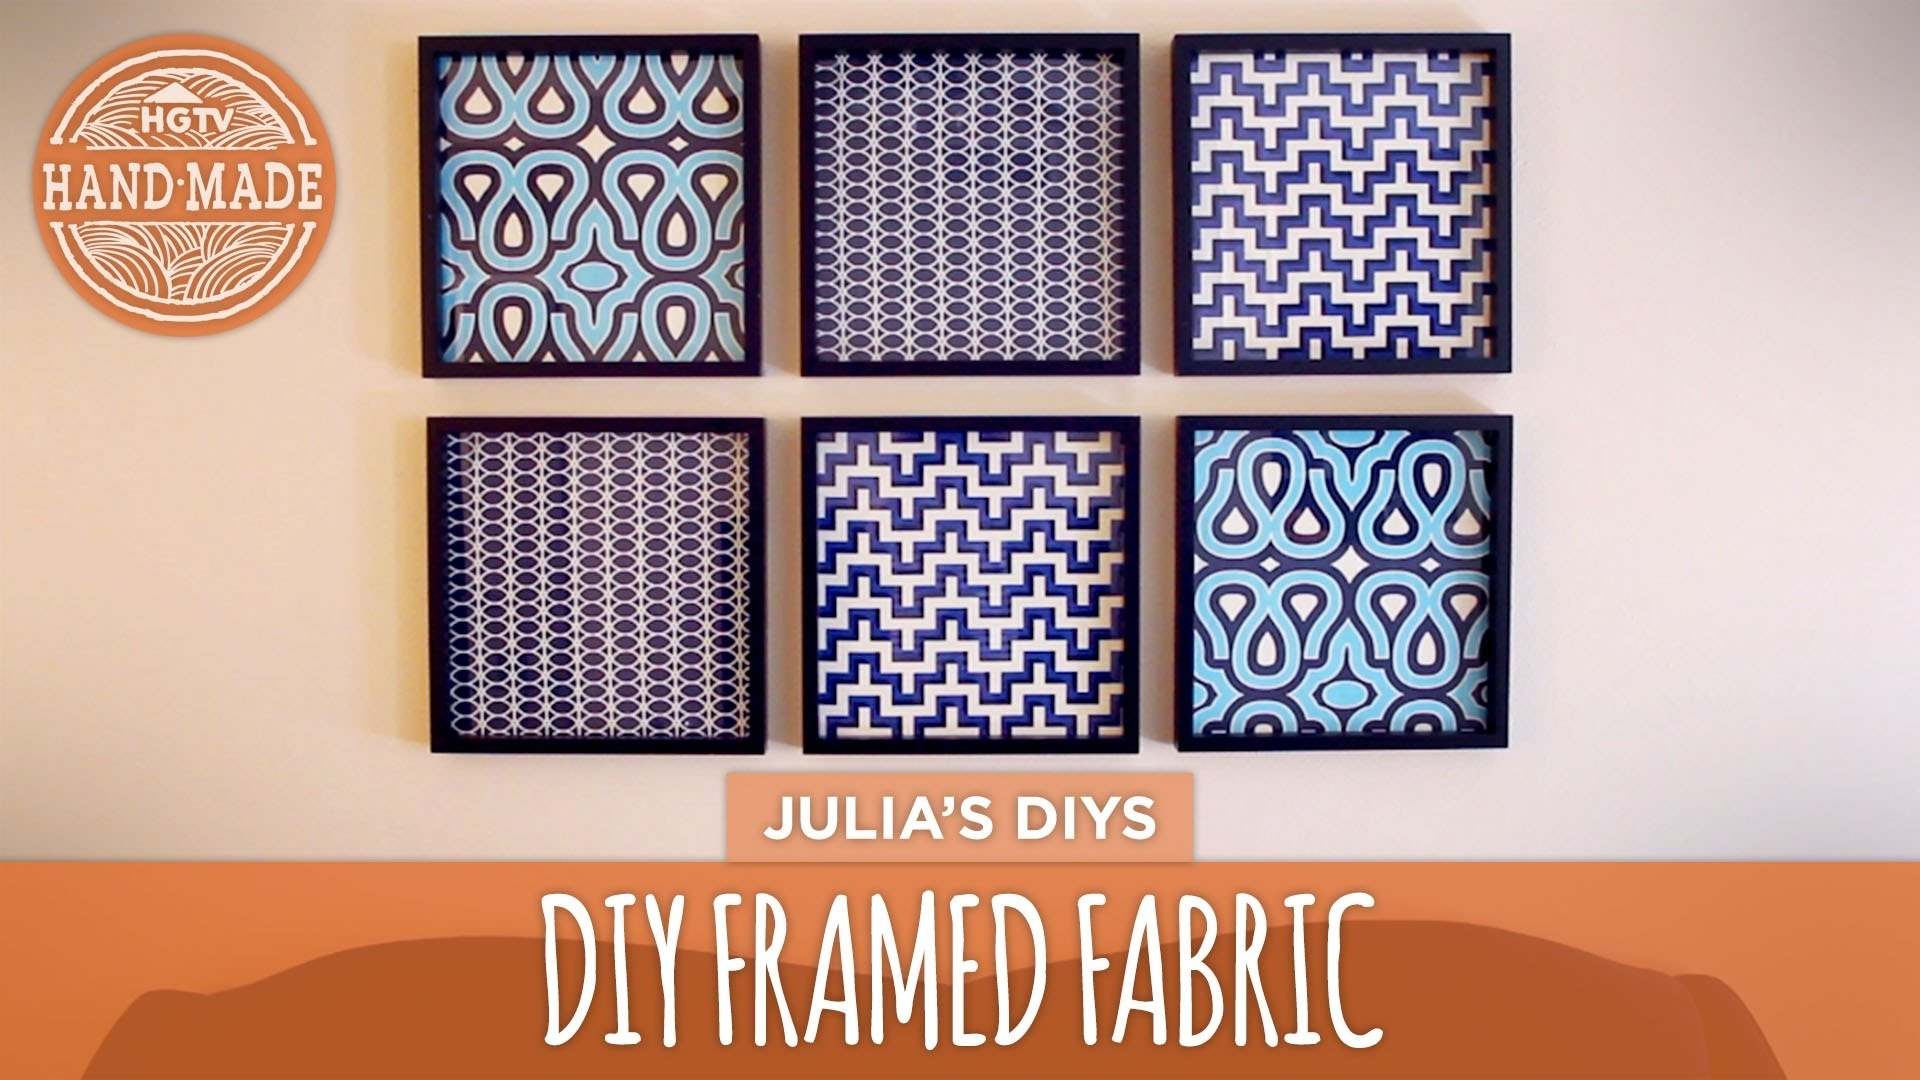 Diy Framed Fabric Gallery Wall – Hgtv Handmade – Youtube With 2018 Batik Fabric Wall Art (View 4 of 15)